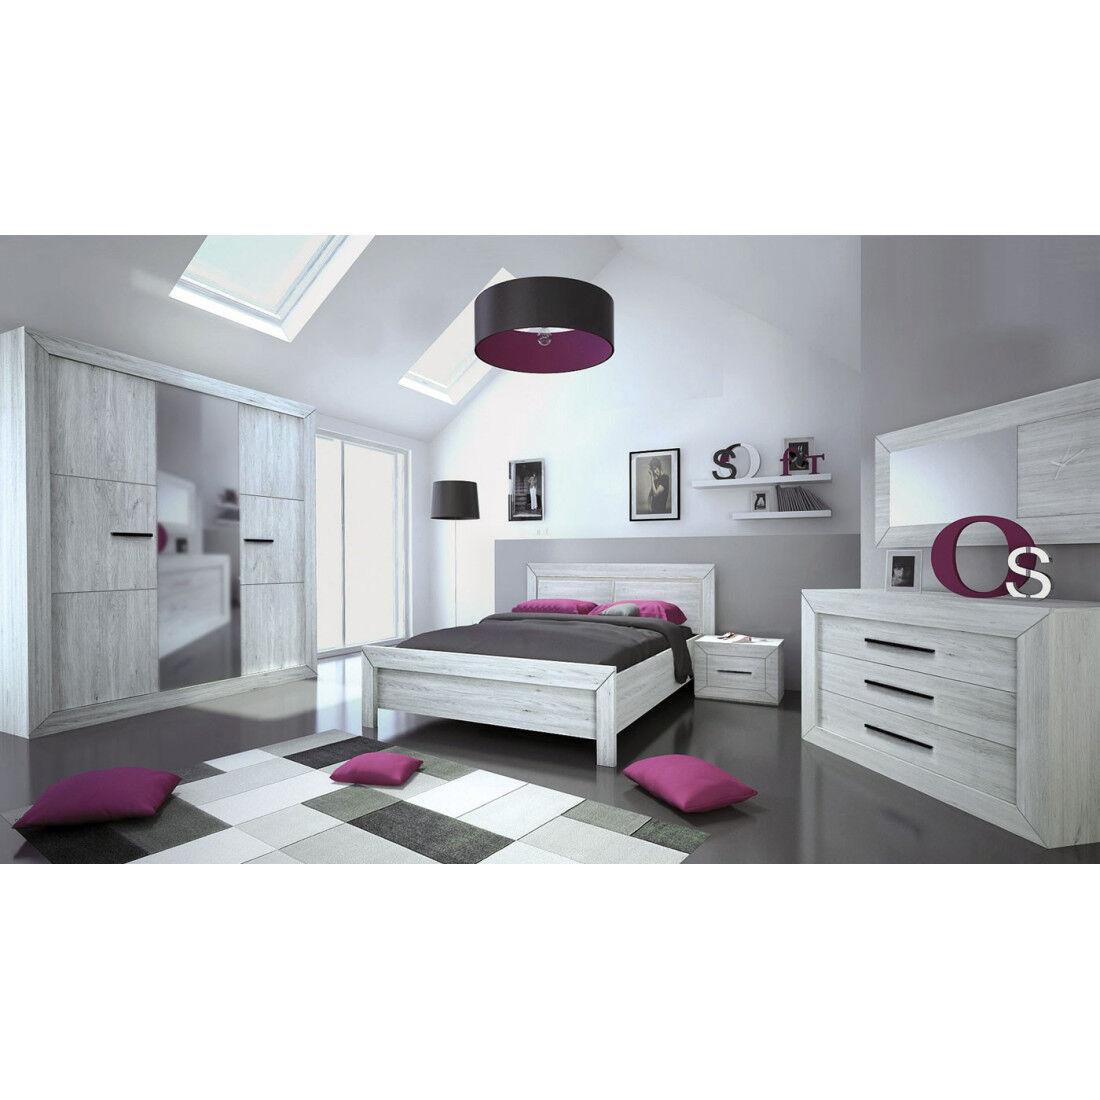 Tousmesmeubles Chambre Adulte Complète (140*190) - PAPEETE - L 168 x l 205 x H 45/90